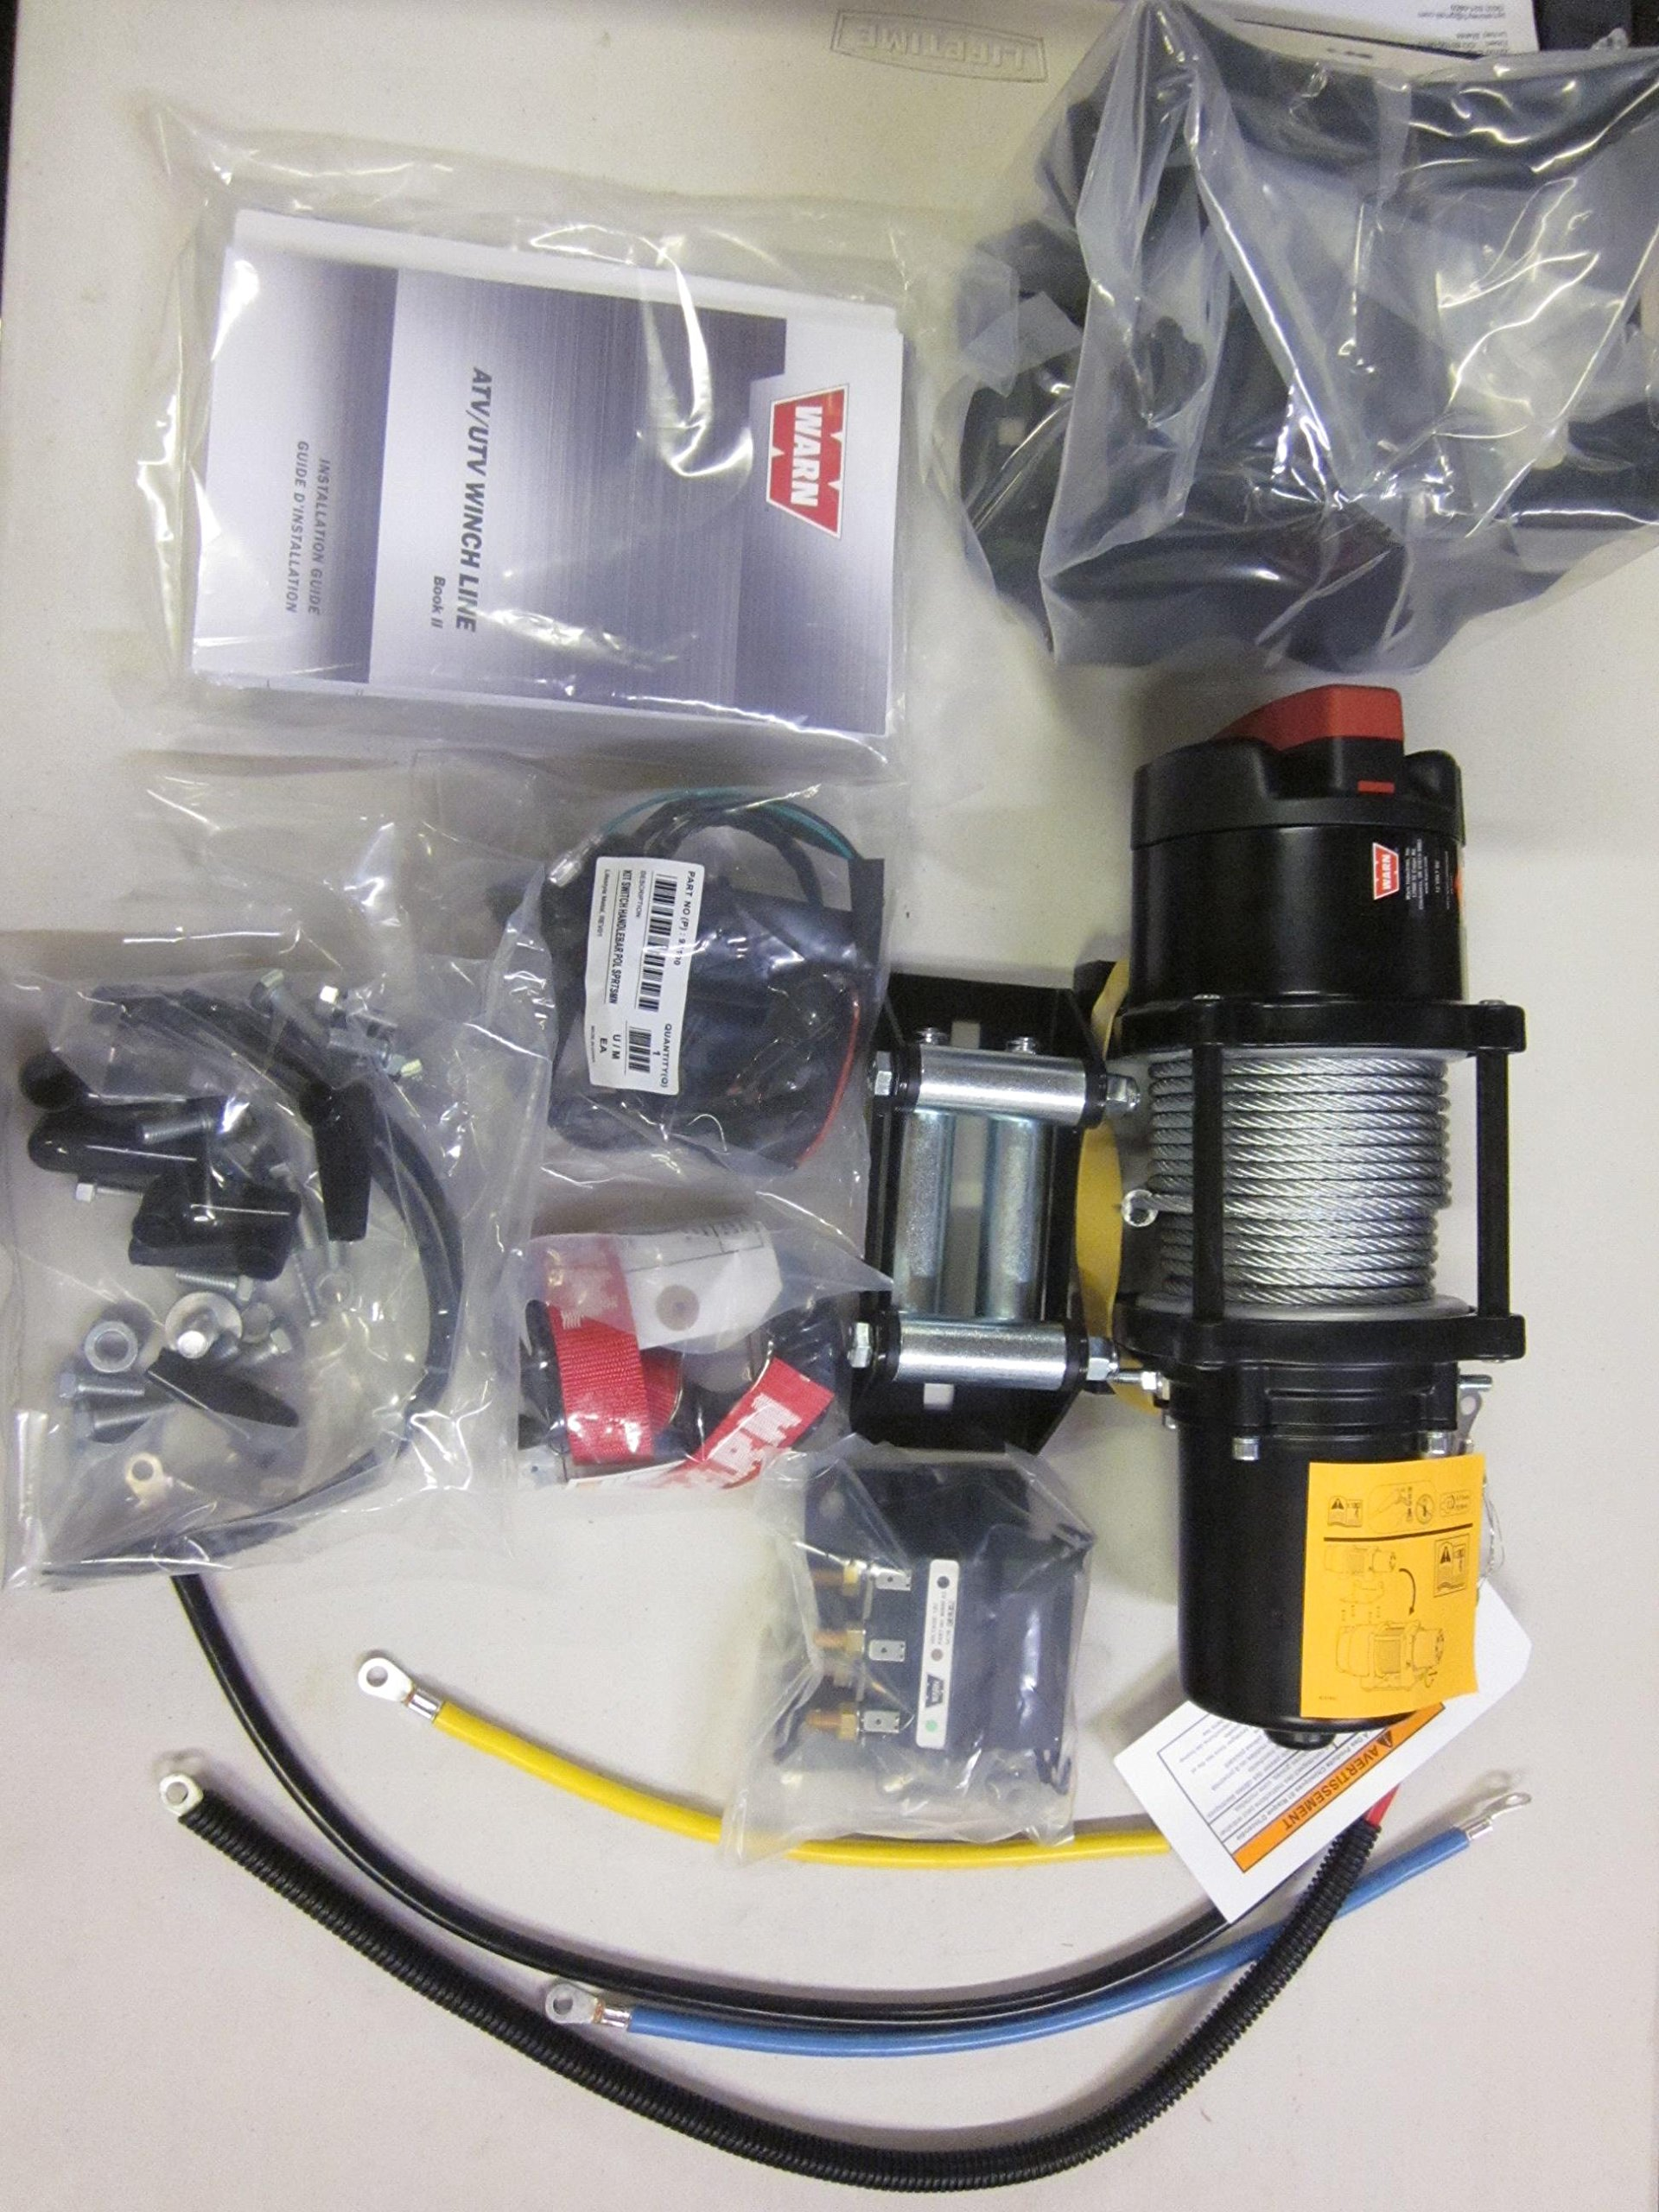 Polaris 2013-16 Ranger 900 1000 Diesel Warn ProVantage 4500 Winch kit- 2880569